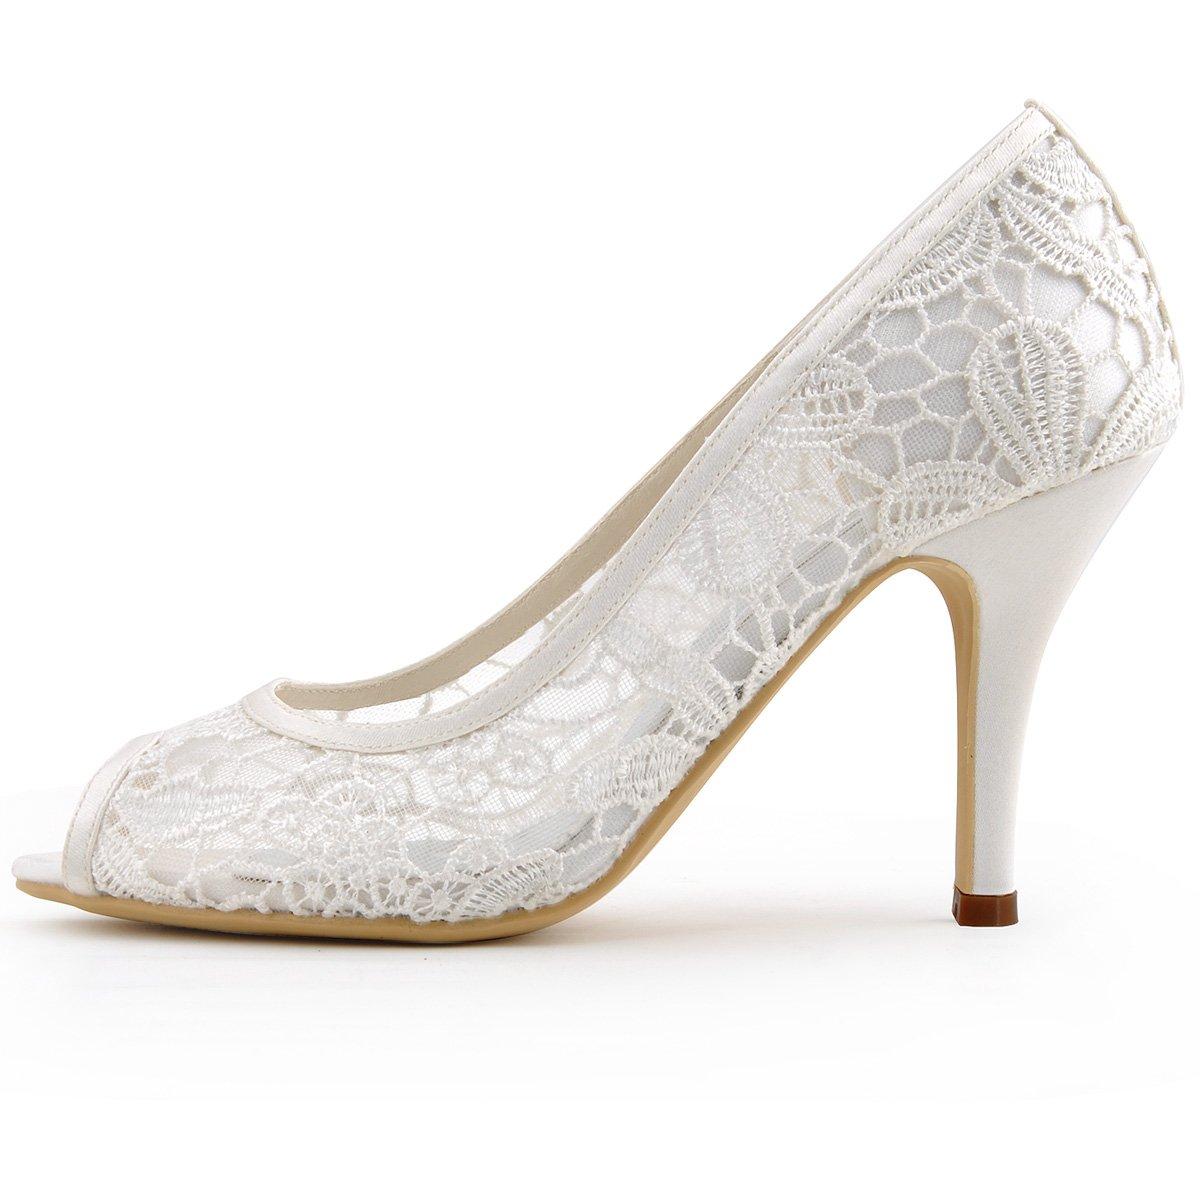 ElegantPark Ivory Women Peep Toe High Heel Pumps Vintage Lace Wedding Dress Shoes 1